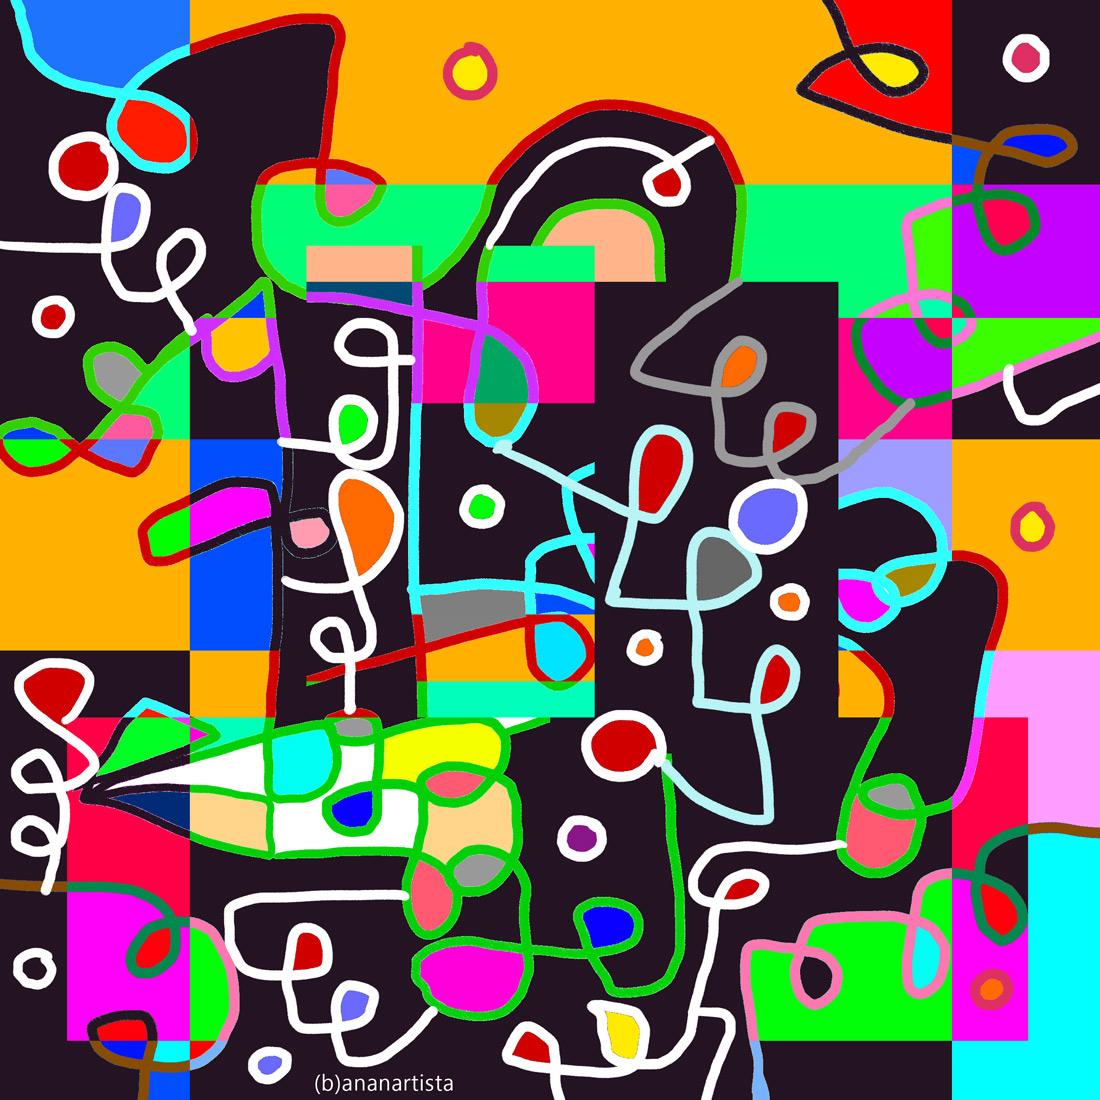 pattern musicale incoerente: digital painting by (b)ananartista sbuff